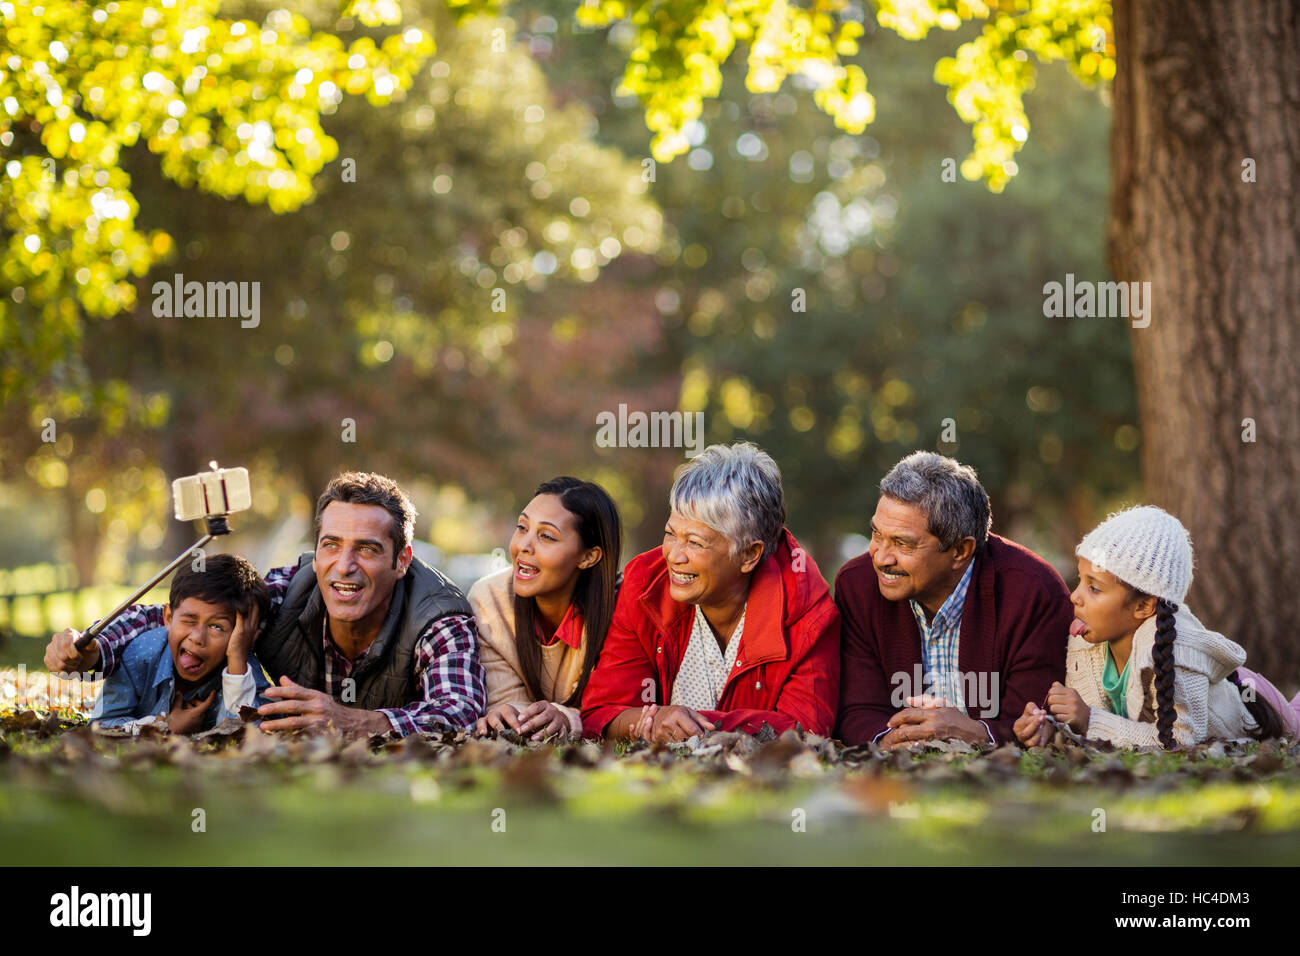 Man with joyful family taking selfie - Stock Image